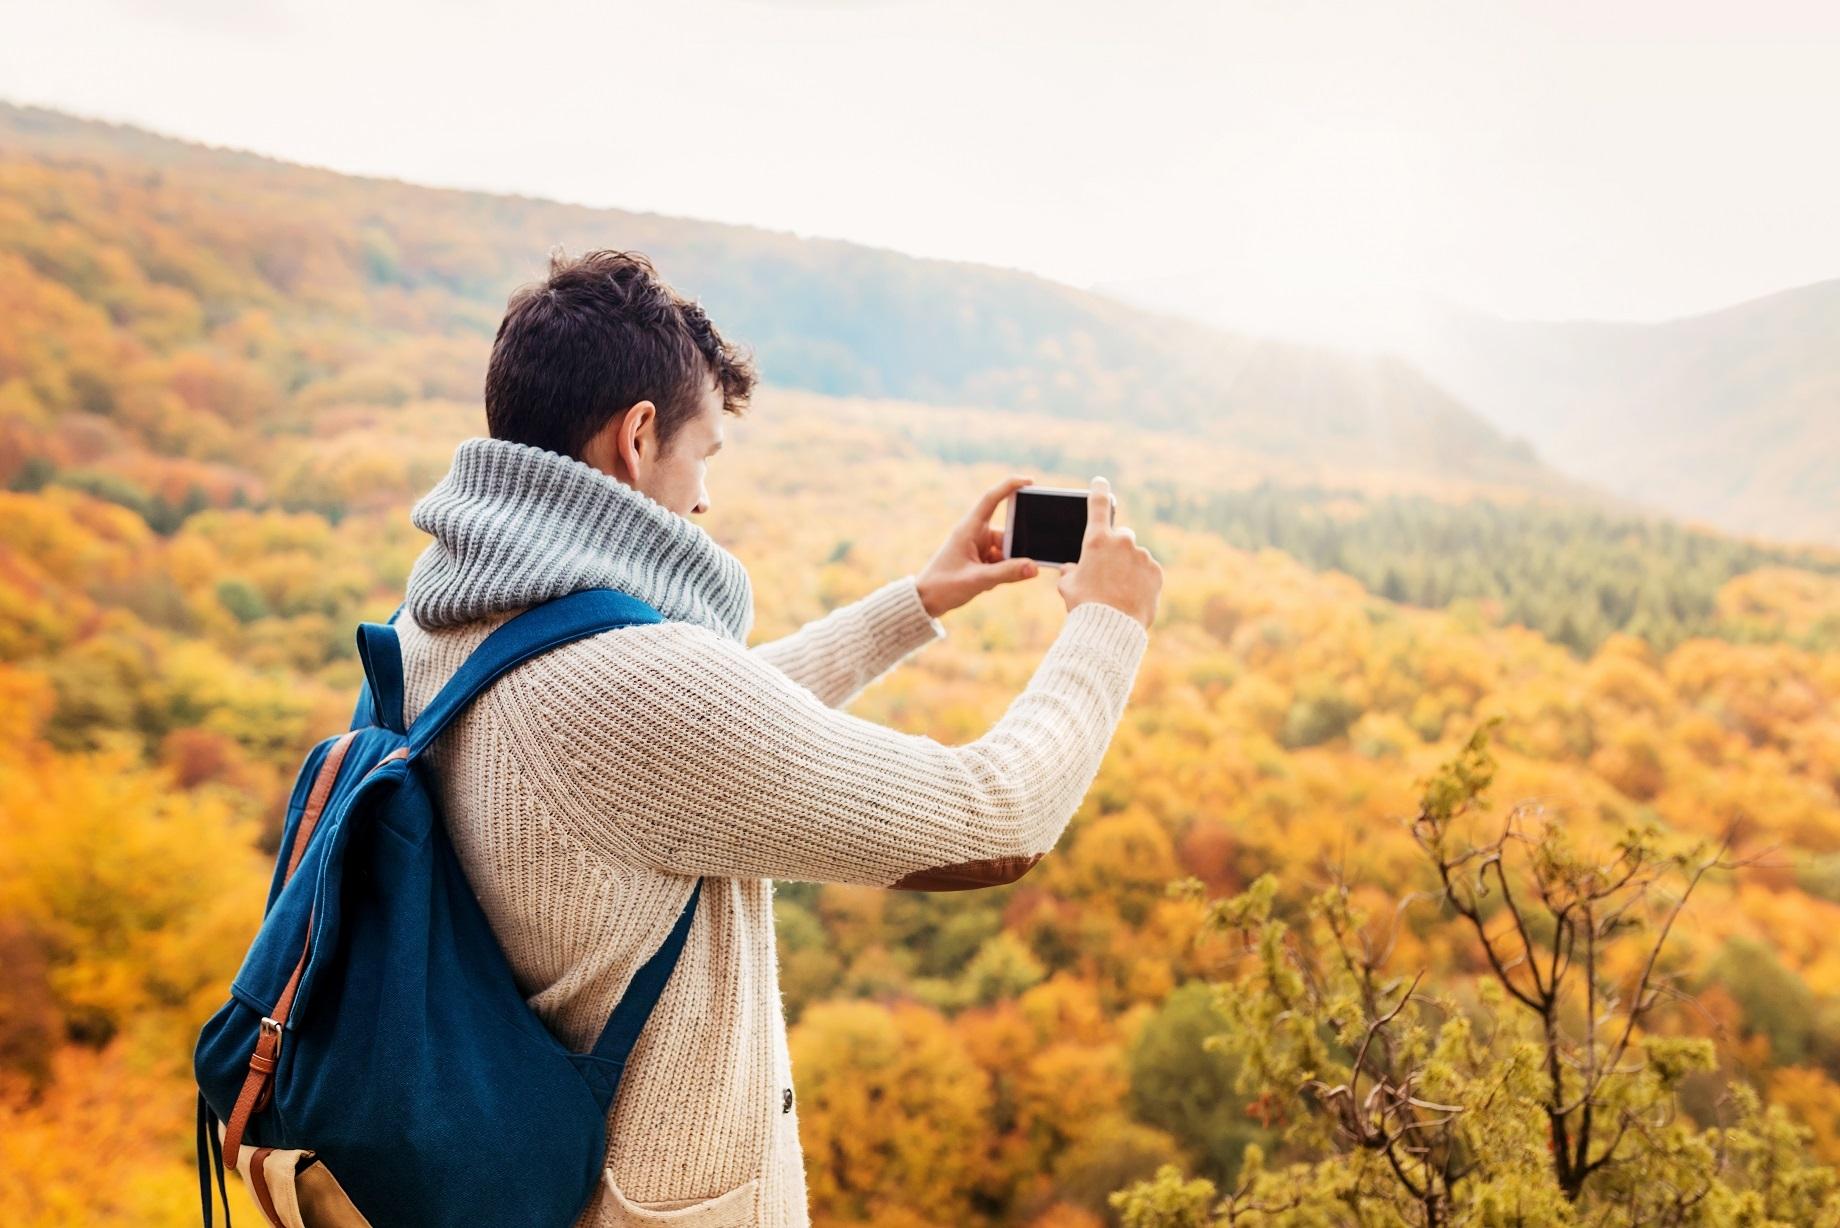 Man taking image of fall mountain scenery